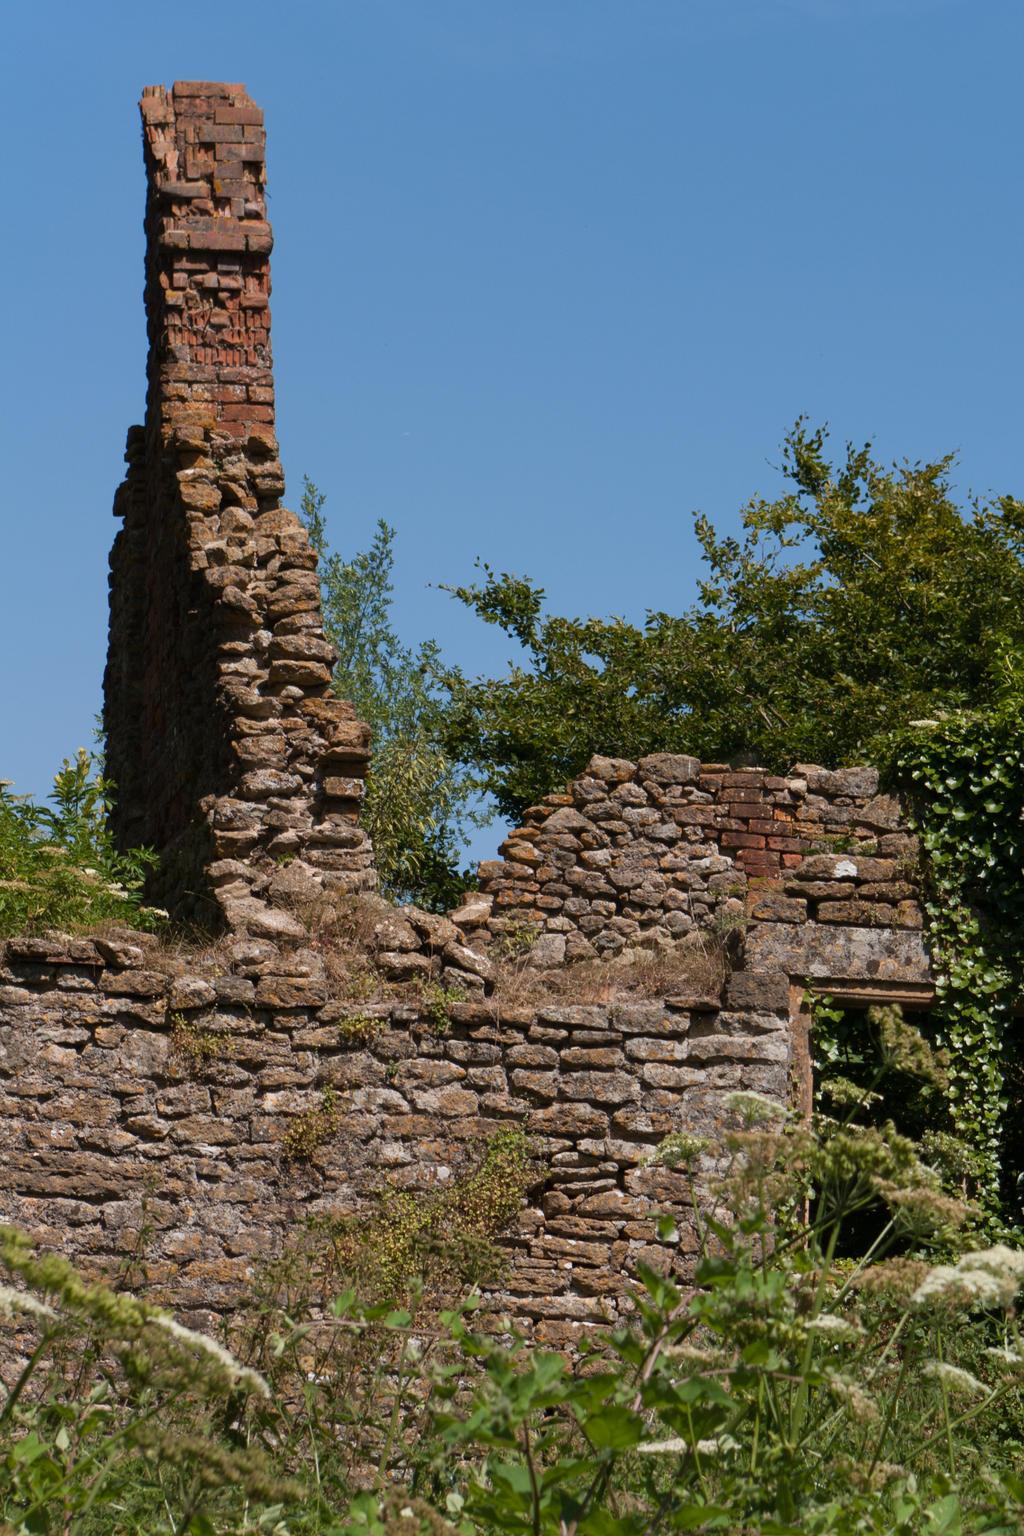 Mells - Abandoned House - 2